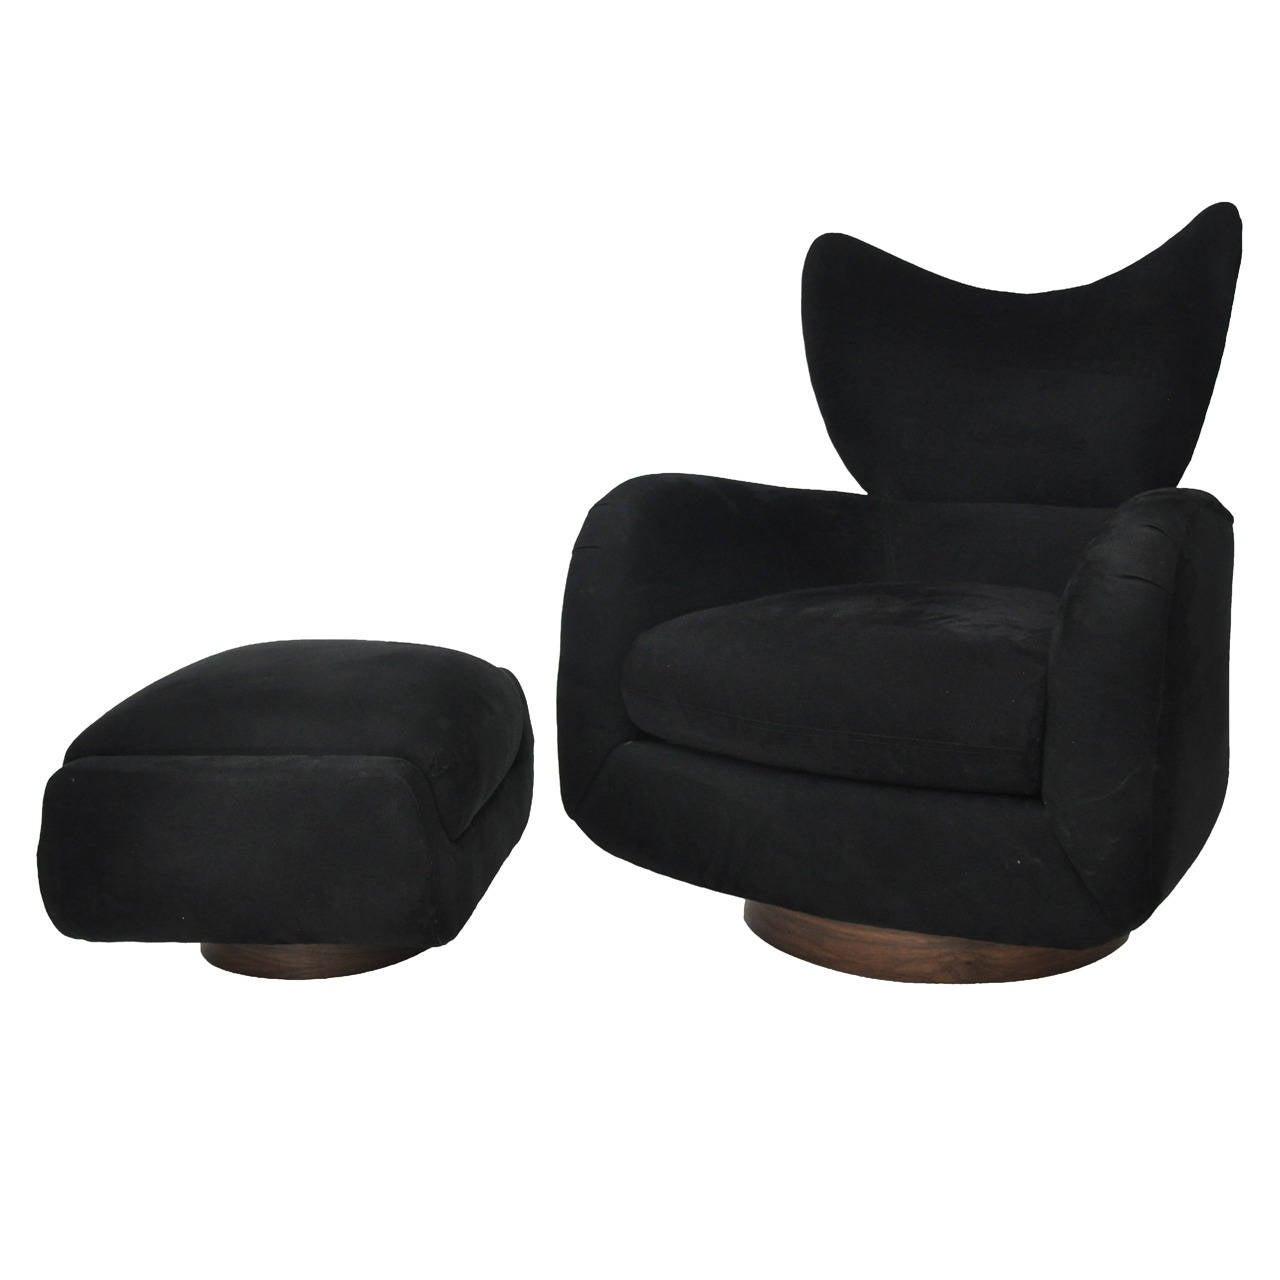 swivel club chair with ottoman elegant dining chairs vladimir kagan lounge at 1stdibs